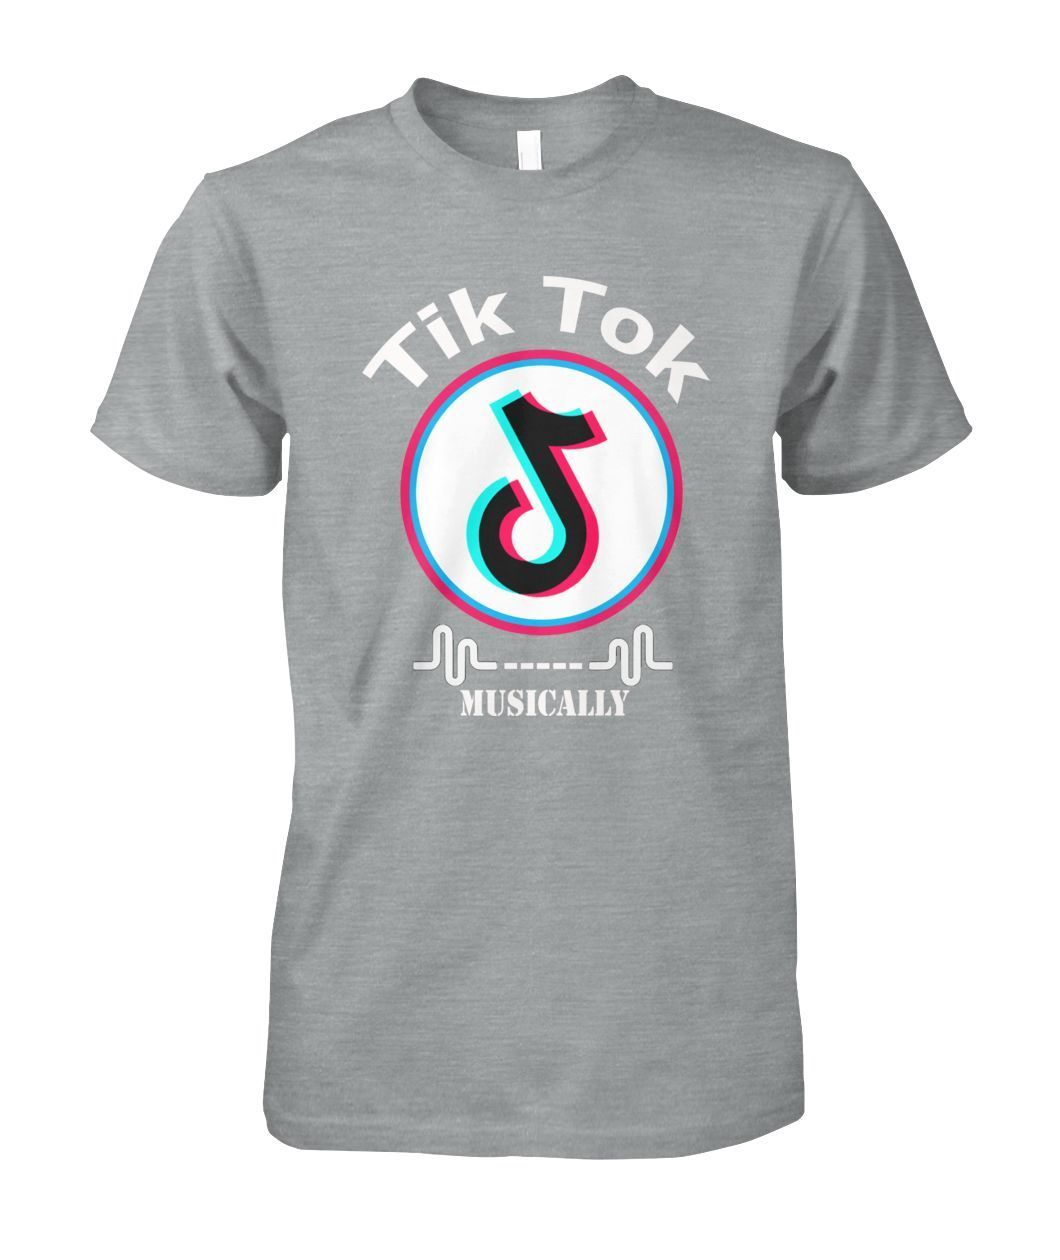 758914179c90 Funny T- Shirt for Men Tik Tok Musically .1046 in 2019 | Music - T ...